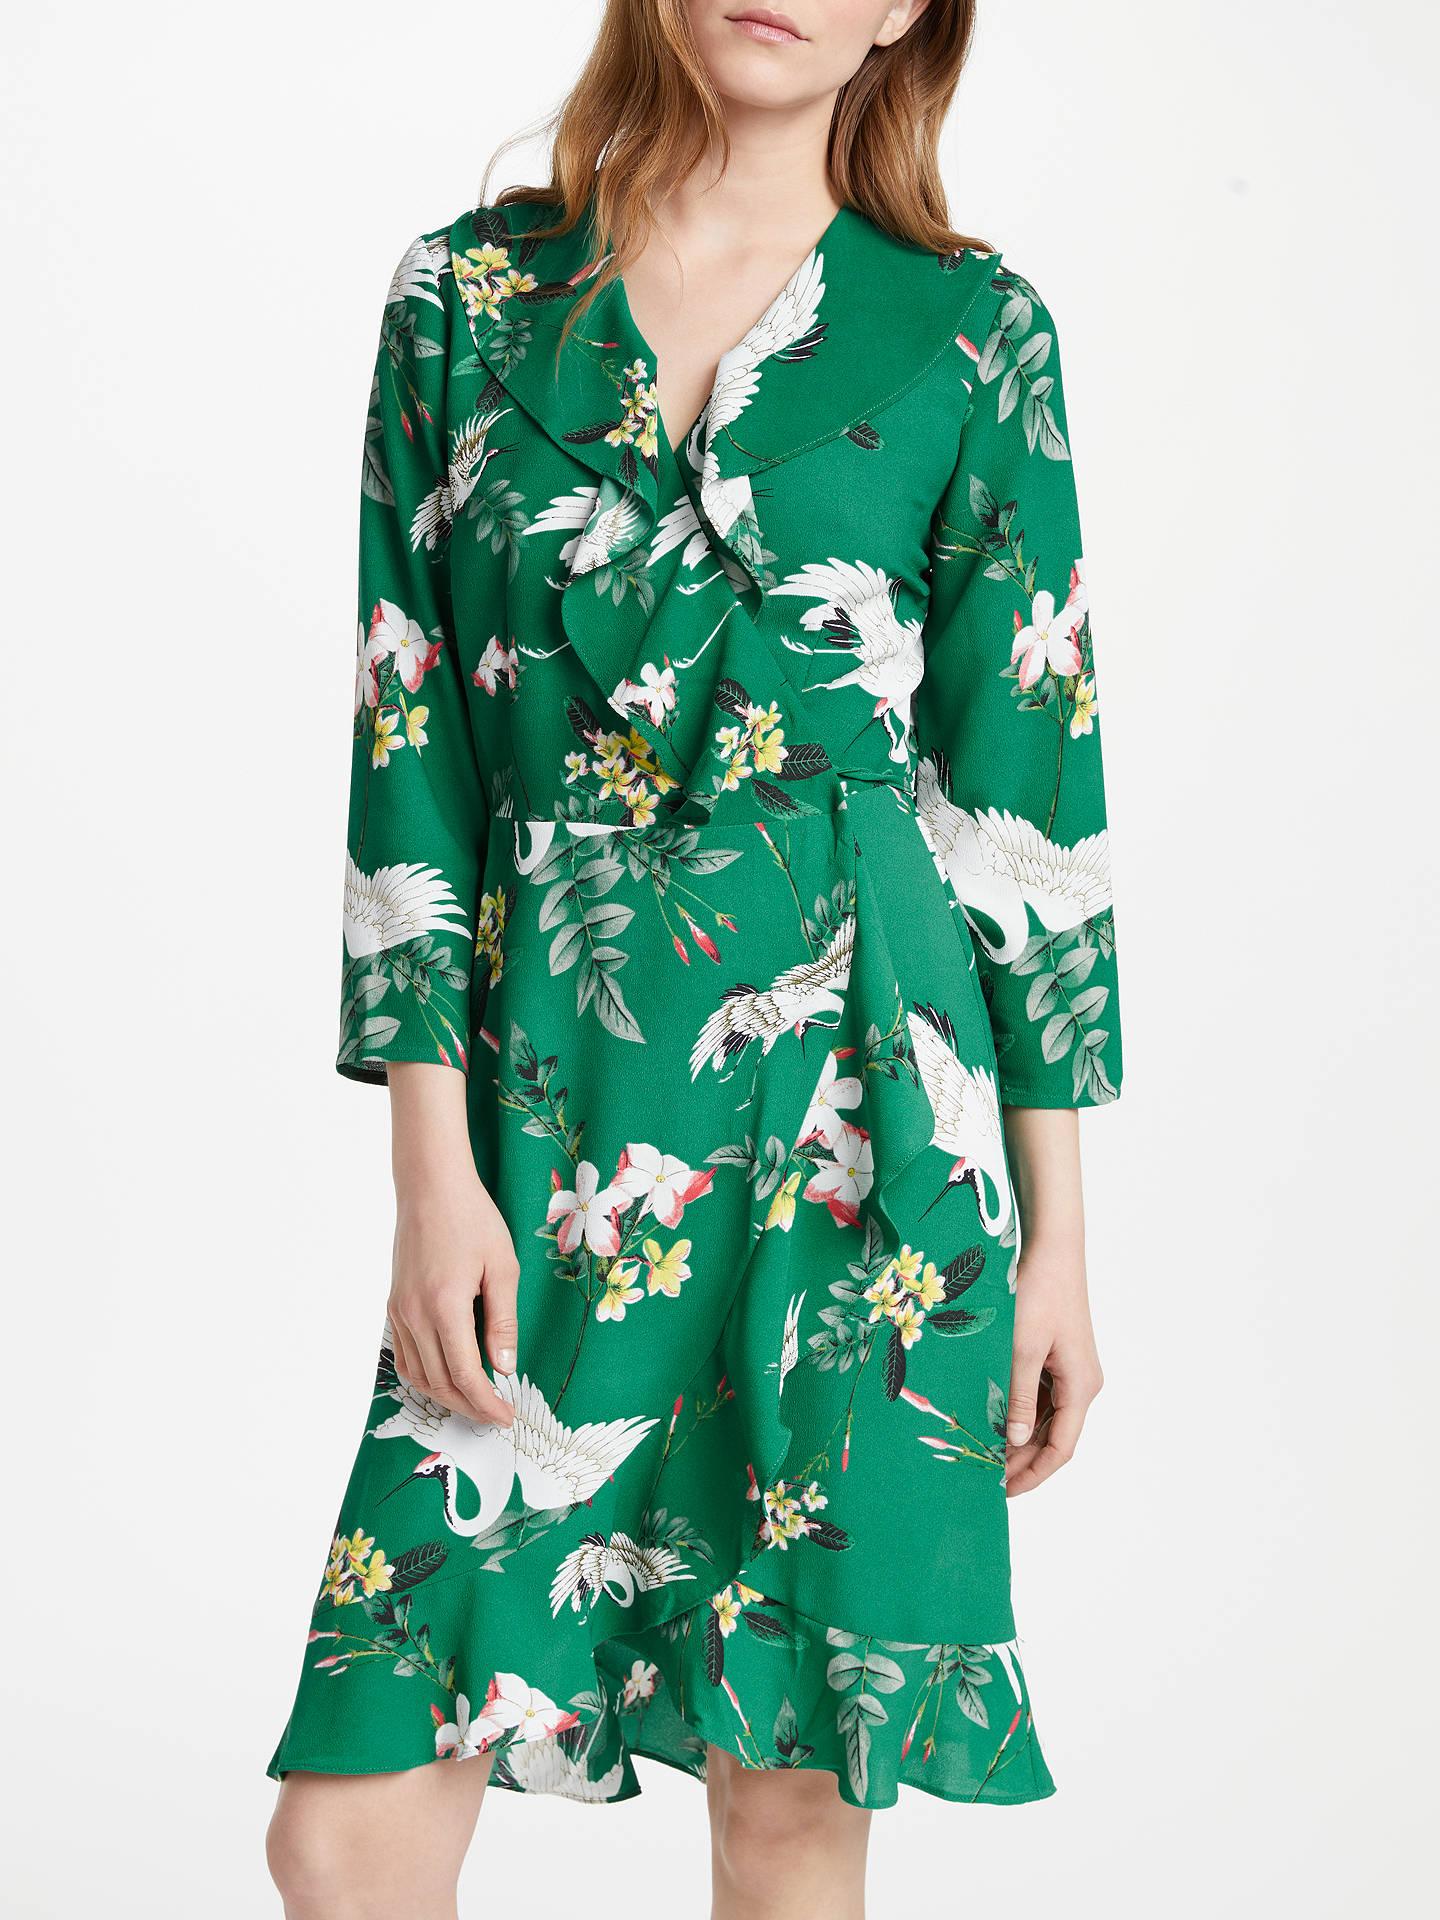 483fc690a240 Buy Y.A.S Crane Wrap Dress, Green, S Online at johnlewis.com ...